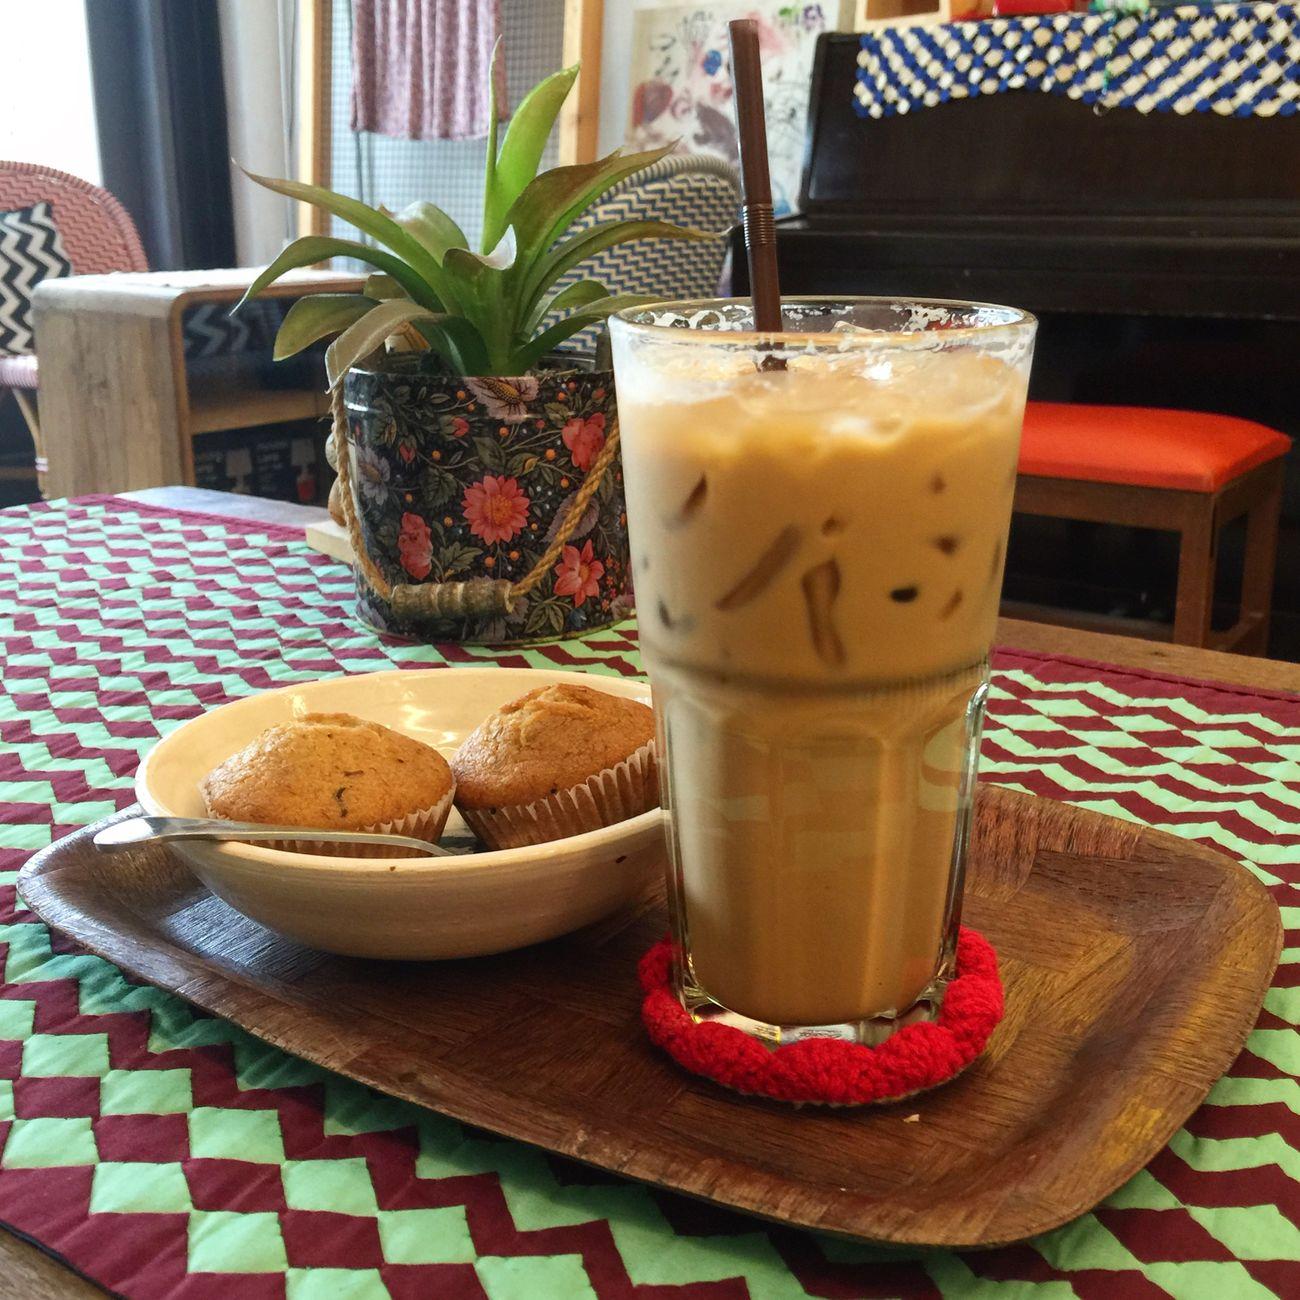 Love coffee. กาแฟร้านโปรด.